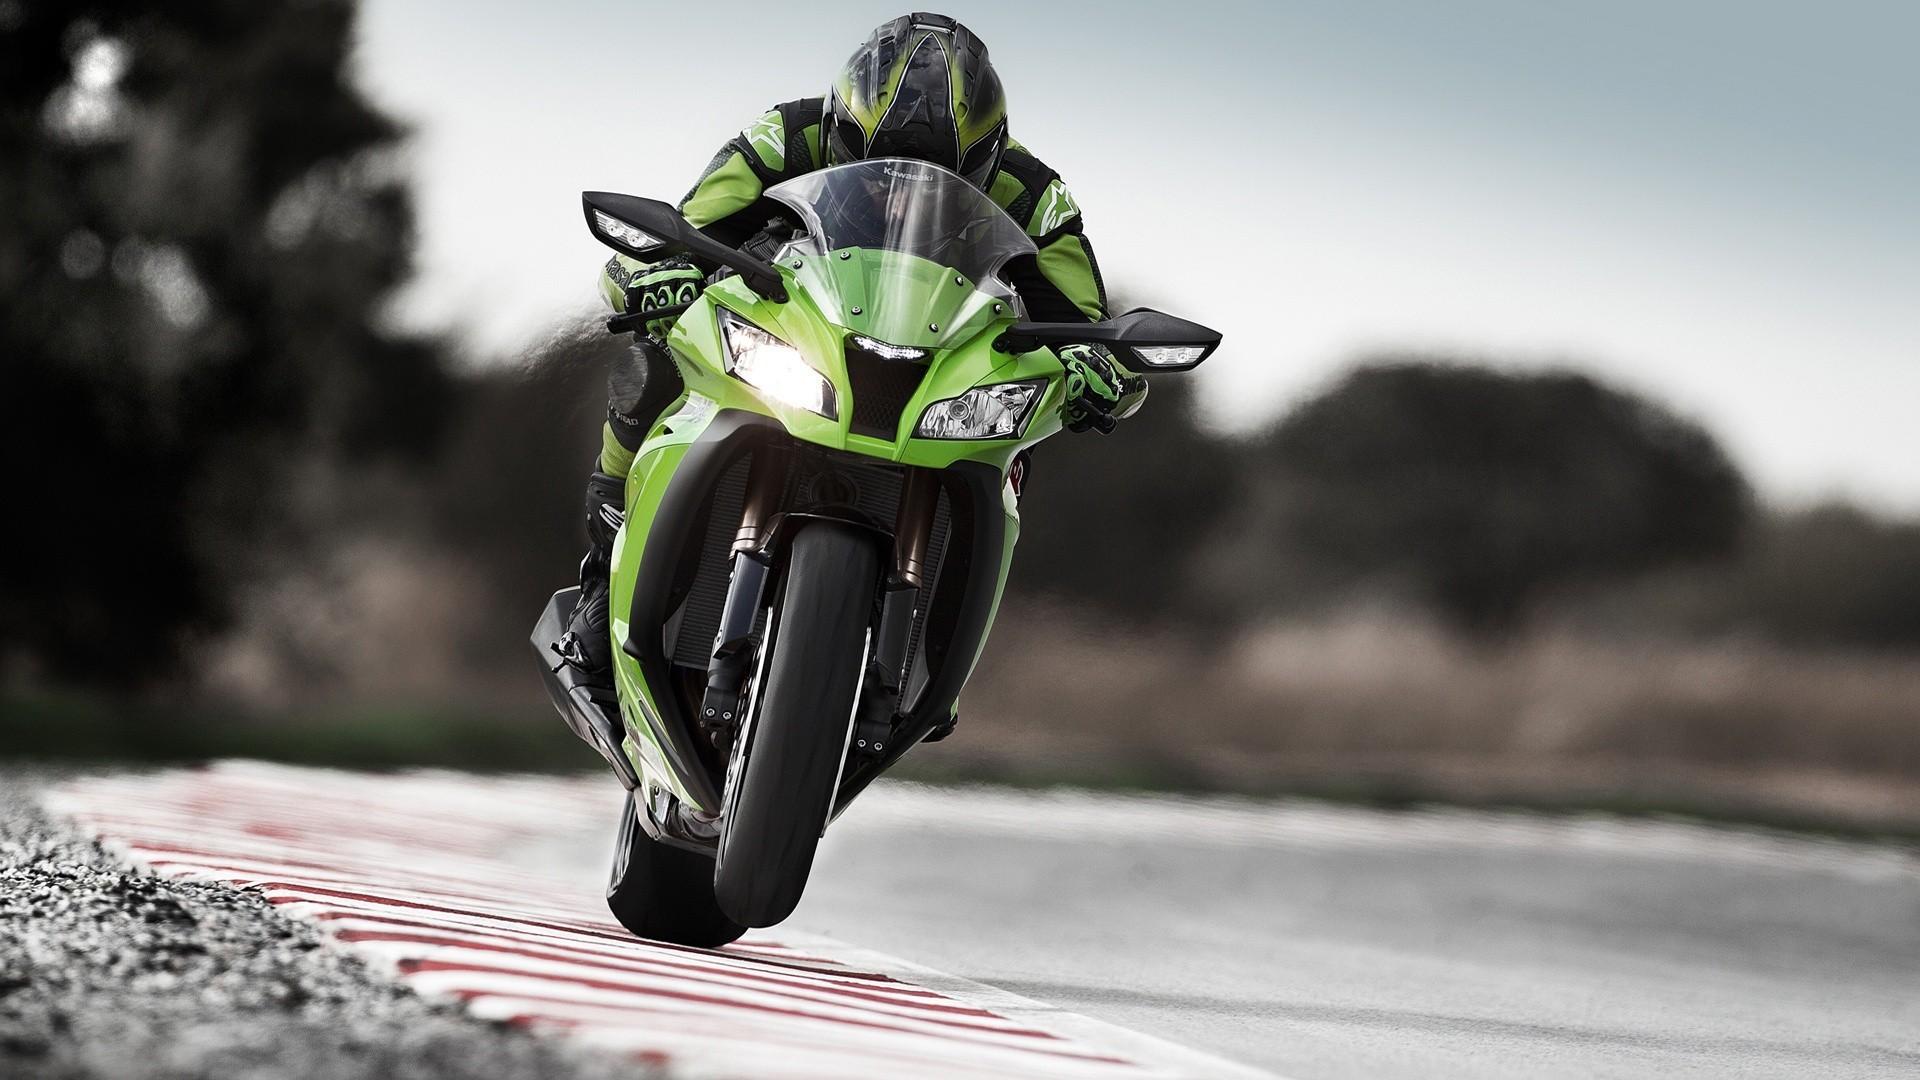 Athlete On A Green Kawasaki Ninja